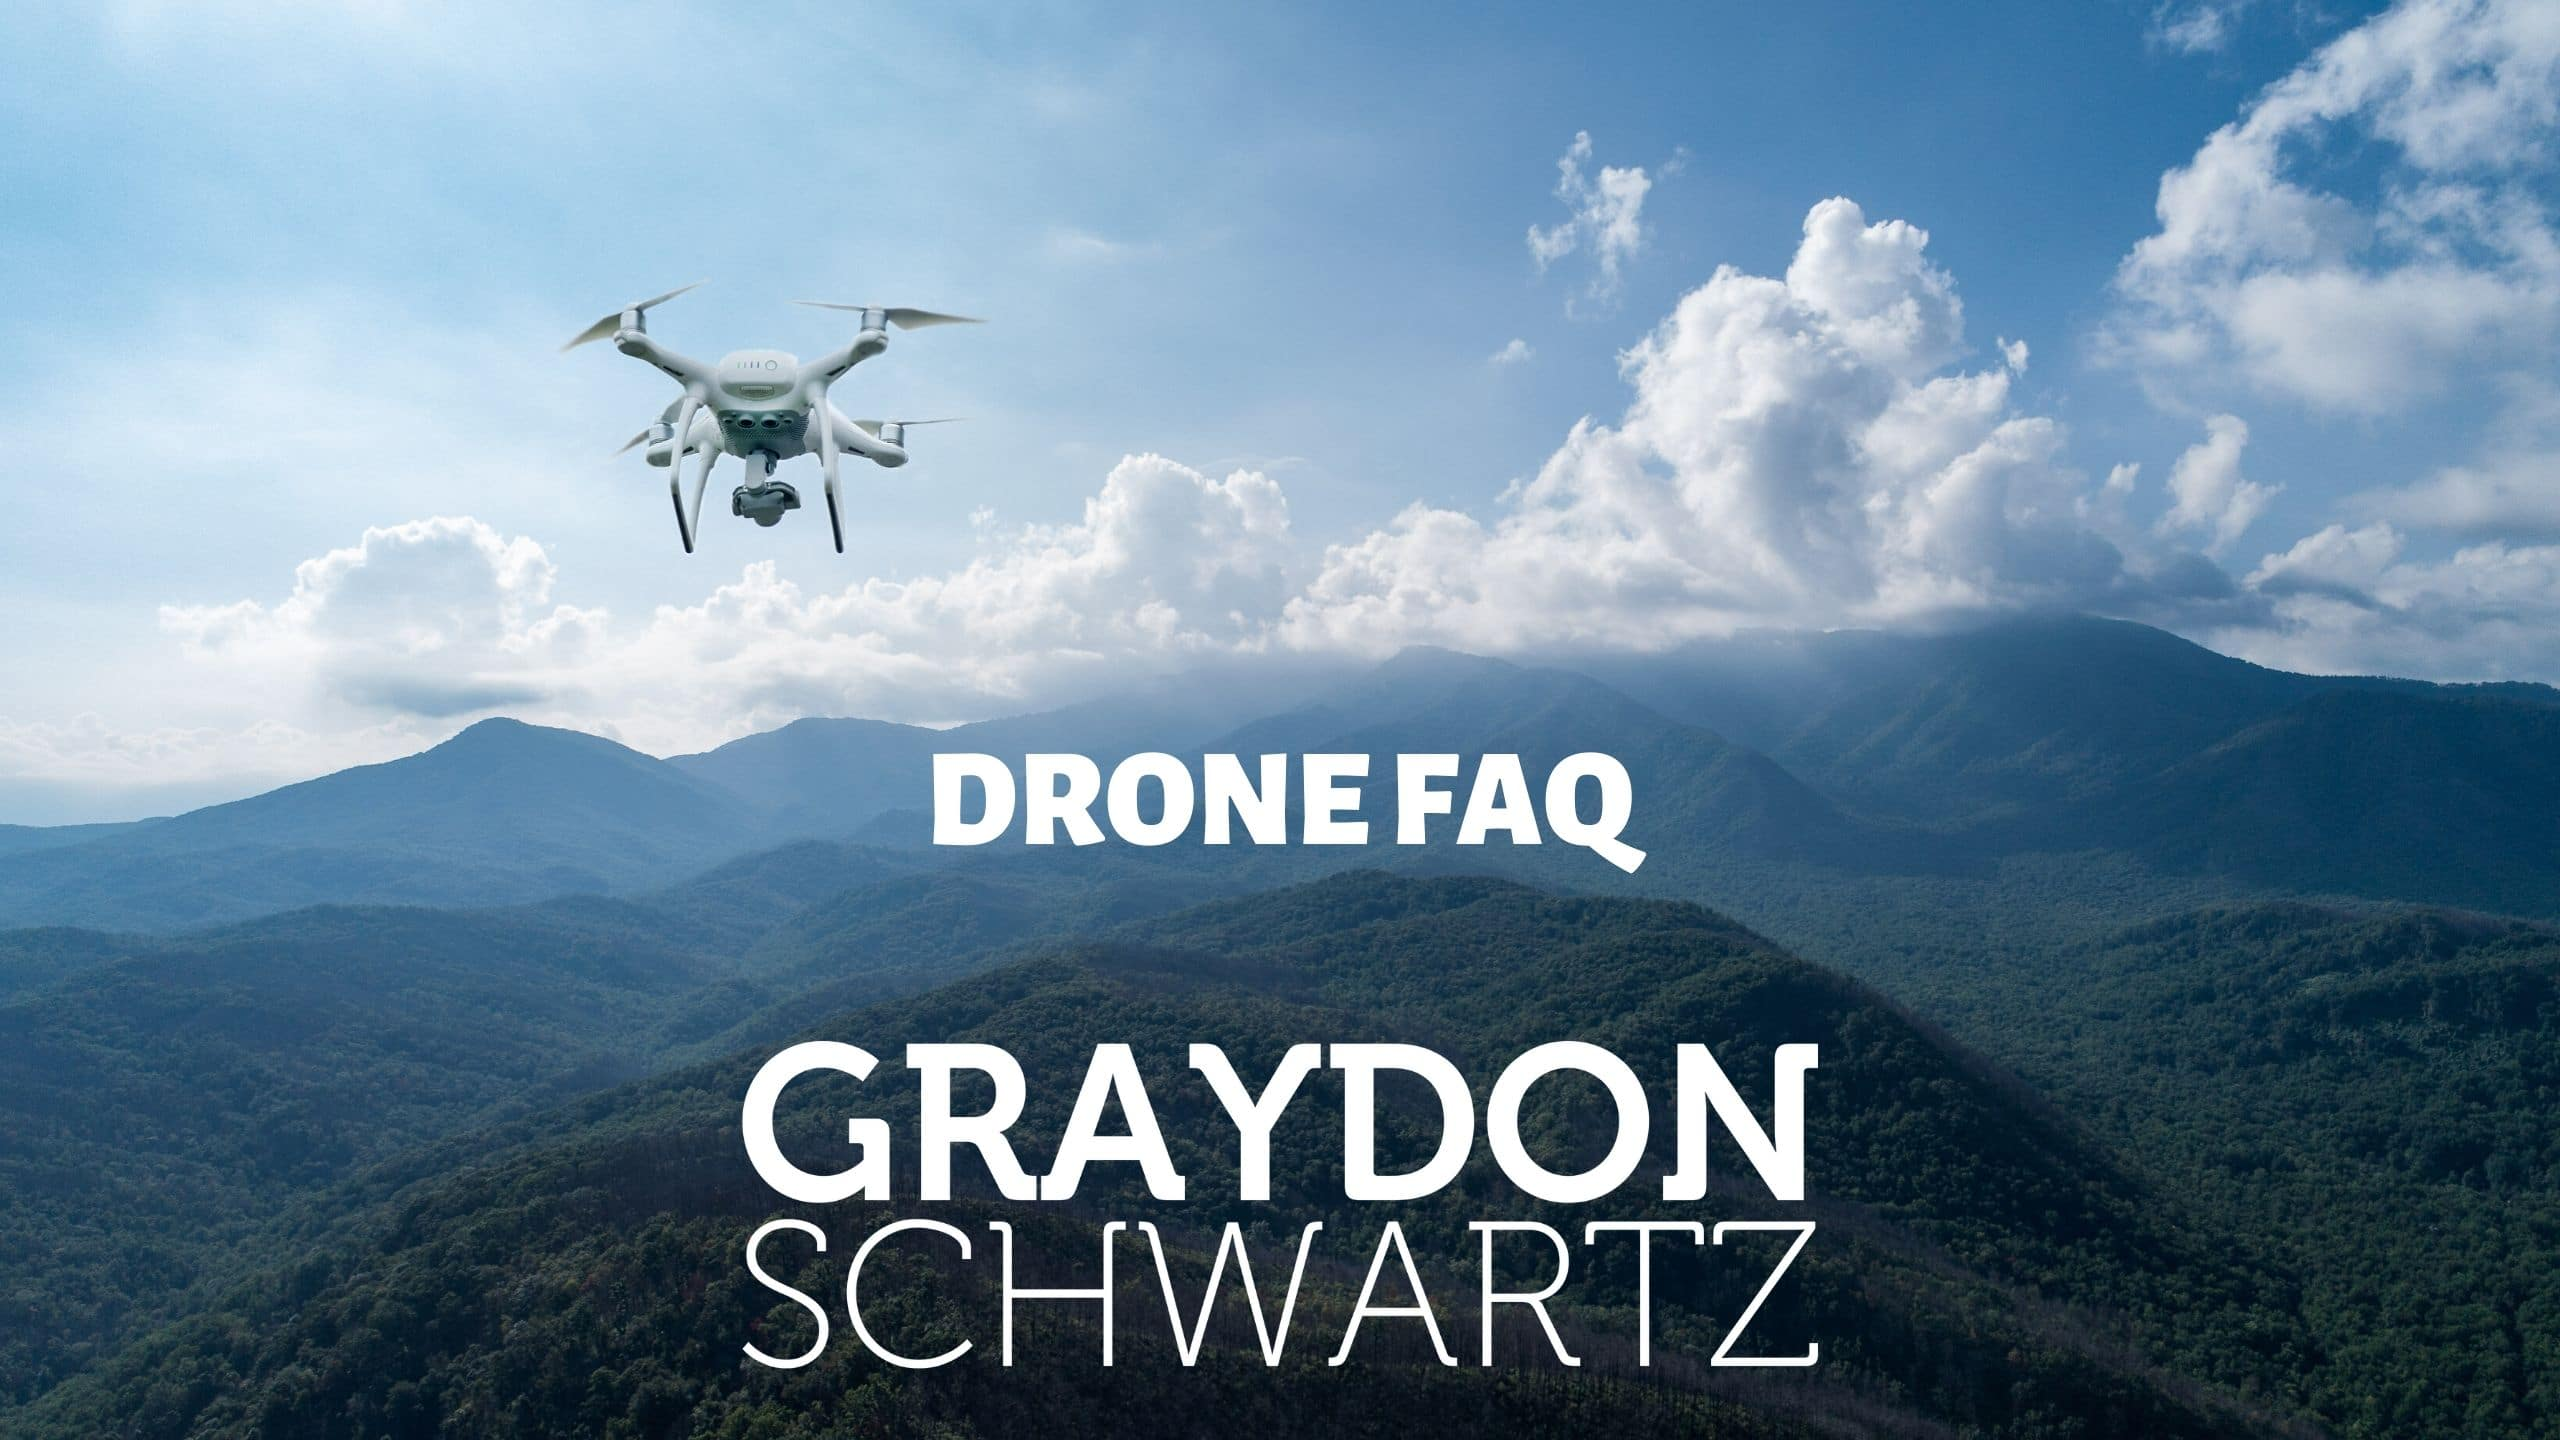 Drone FAQ